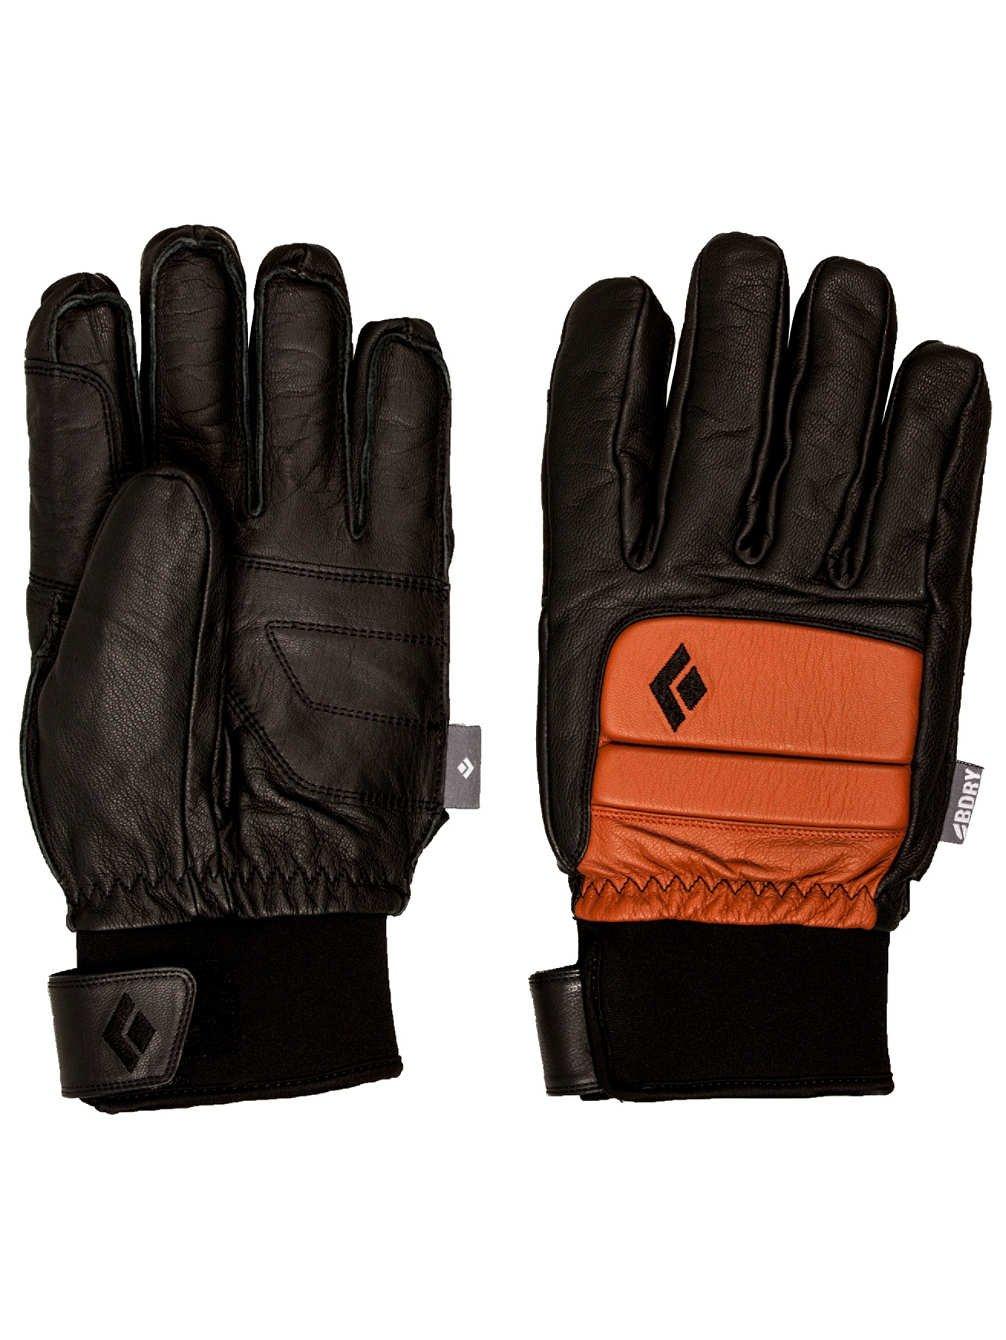 Black Diamond Spark Gloves Cold Weather Gloves Black Diamond Equipment LTD 801595